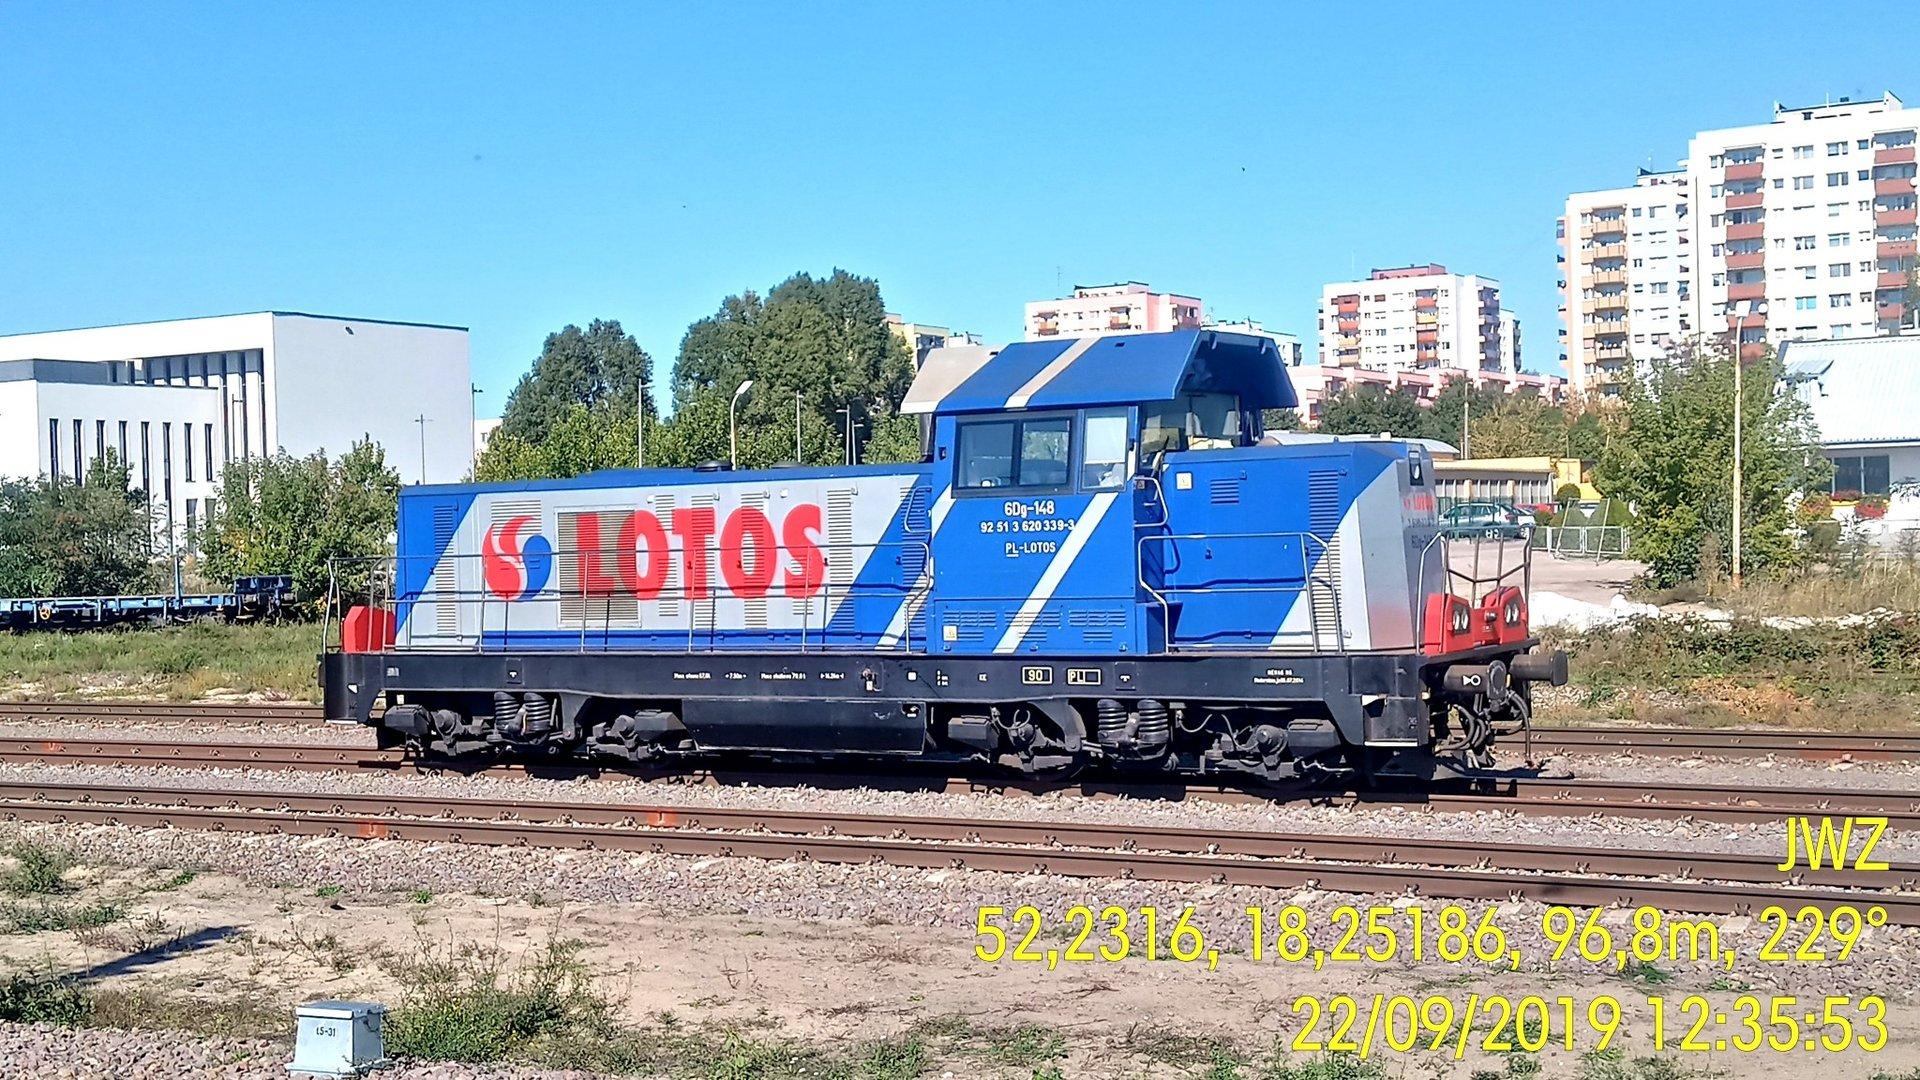 6Dg-148.jpg